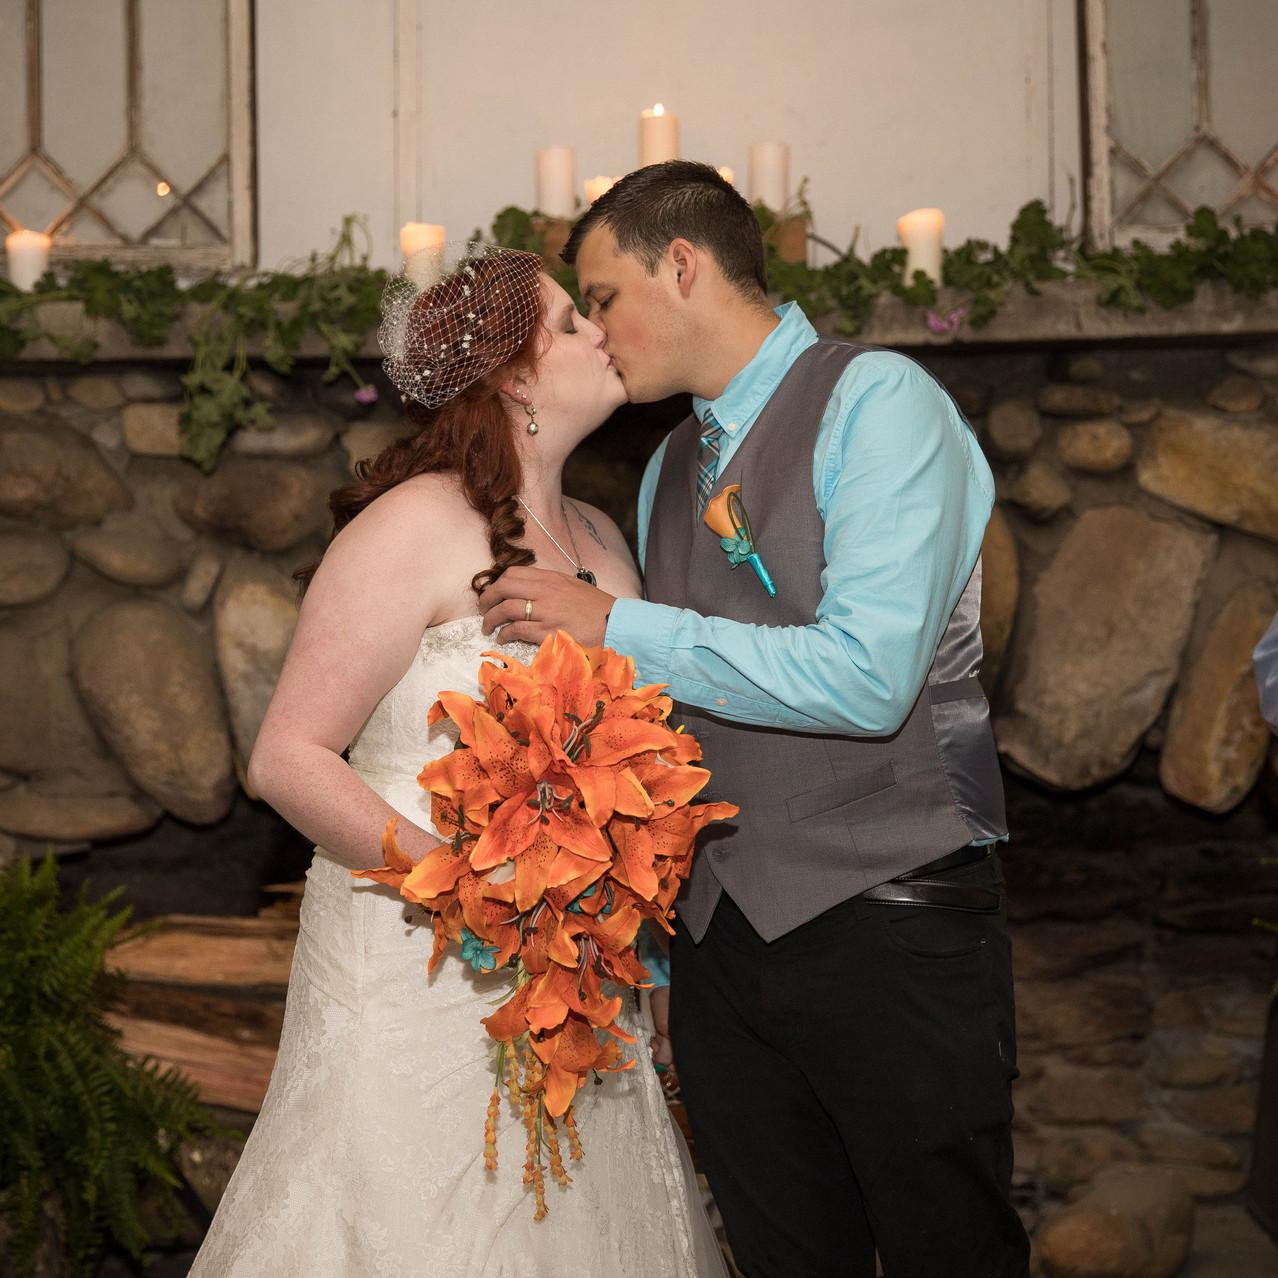 Megan and Michael s Wedding-MeganEarpFinal-0109